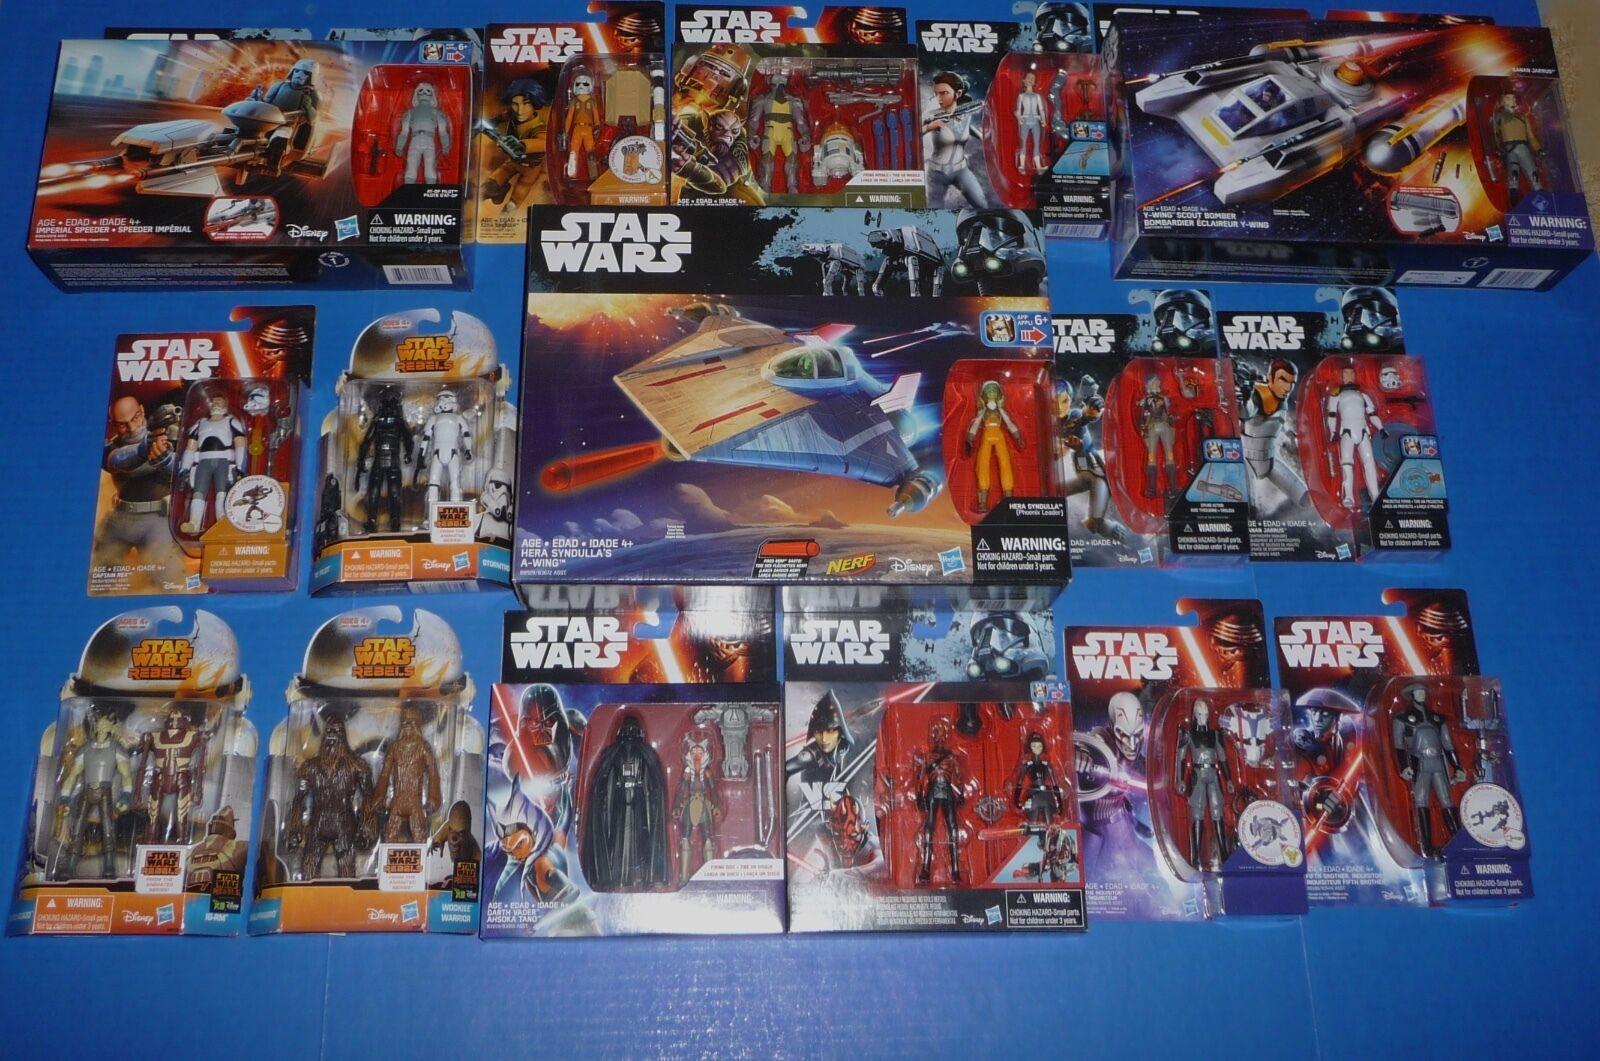 Star Wars Rebeldes Figuras  barcos SetLote-Ahsoka, Maul, Sabine, Hera, Ezra, Vader